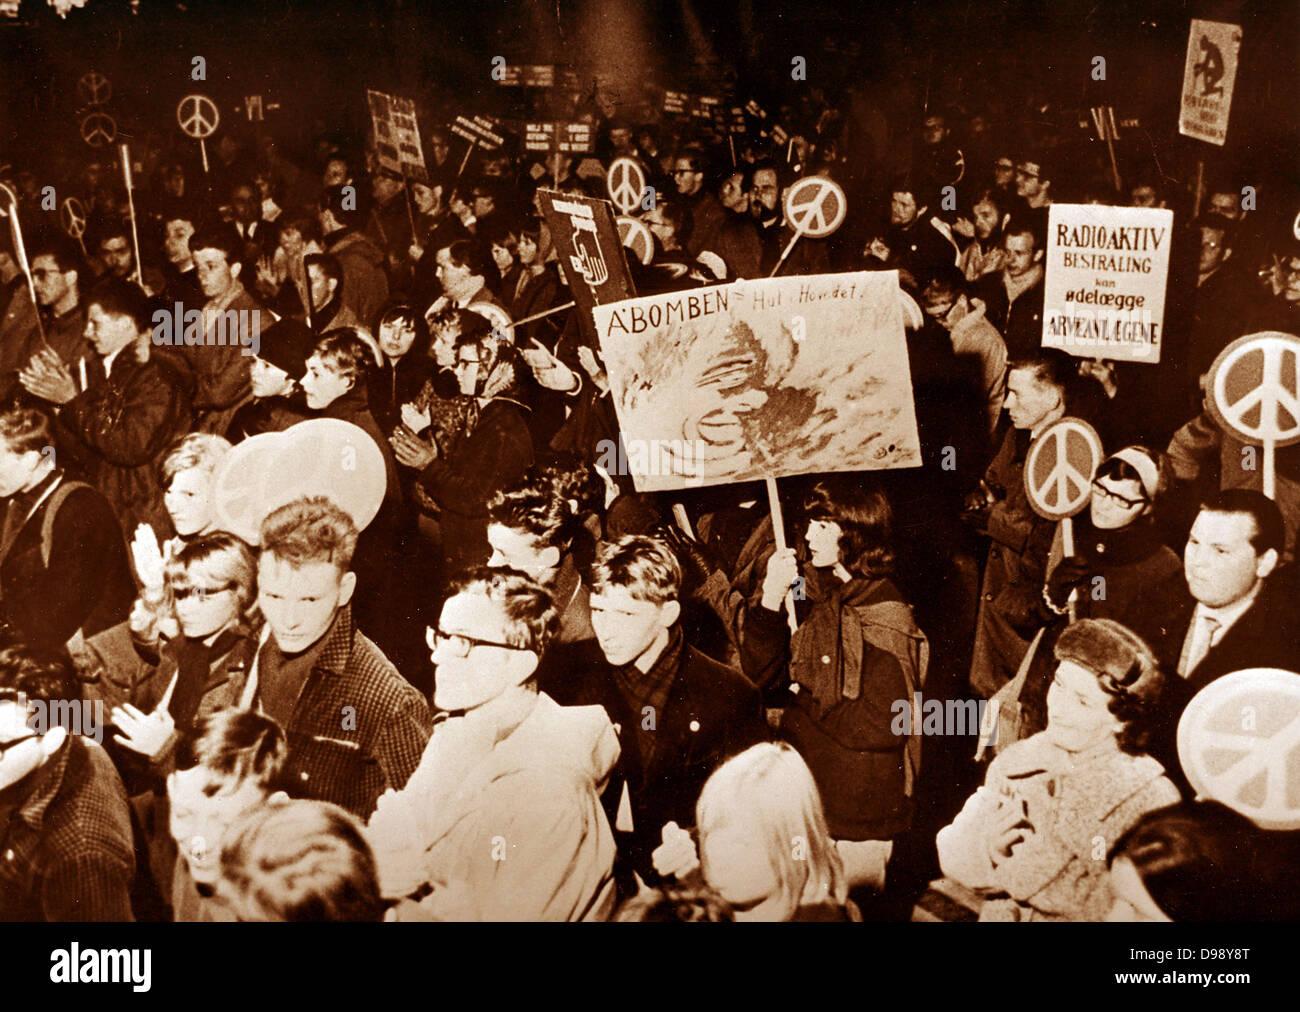 Manifestación antinuclear en Francia durante la década de 1960 Imagen De Stock